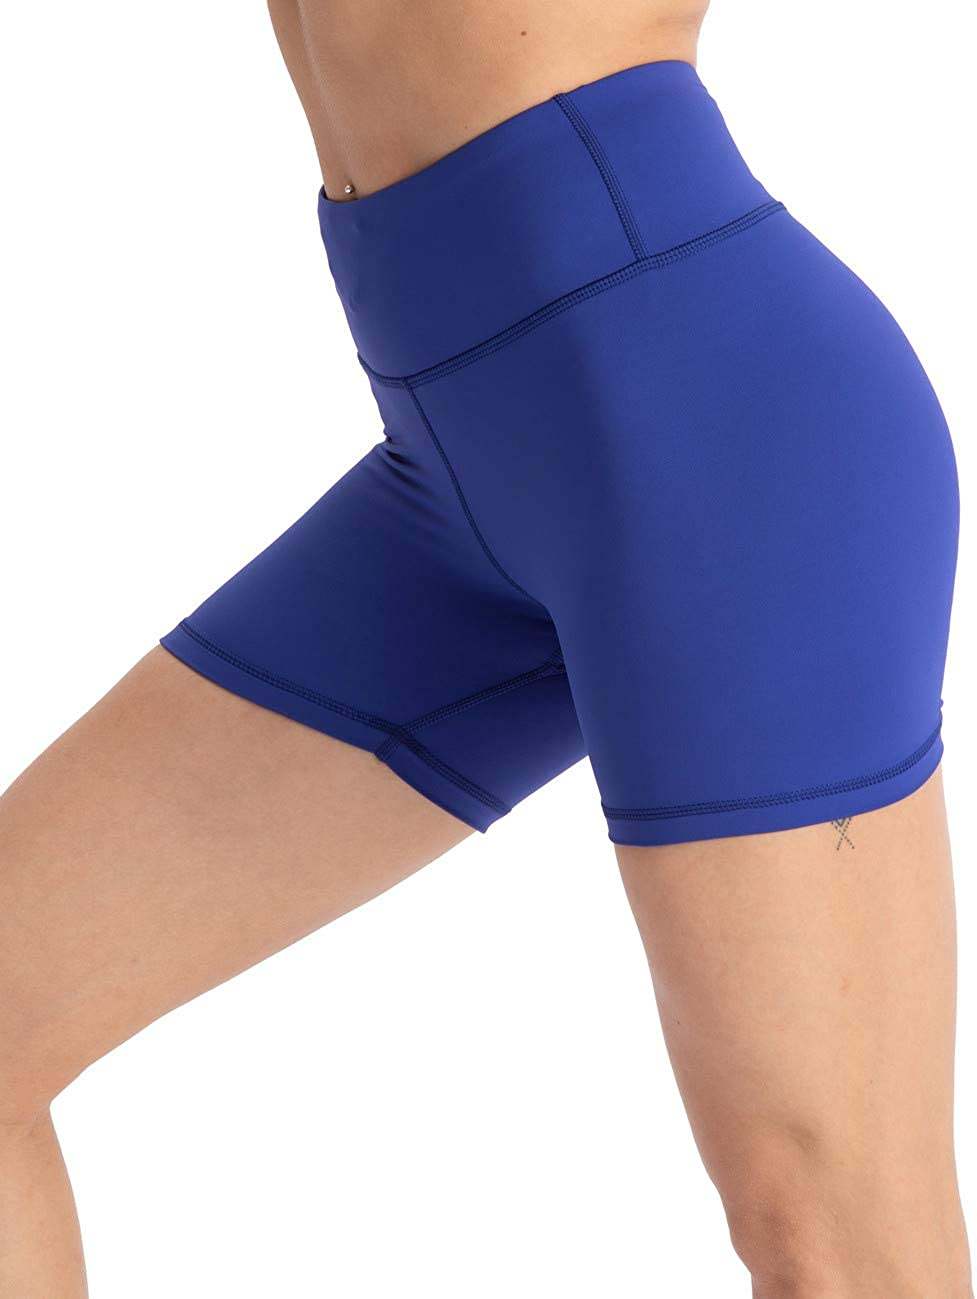 Enge Innentasche Yoga-Shorts Workout-Shorts Hopgo Damen Trainingshose 10,2 cm Bauchkontrolle hohe Taille